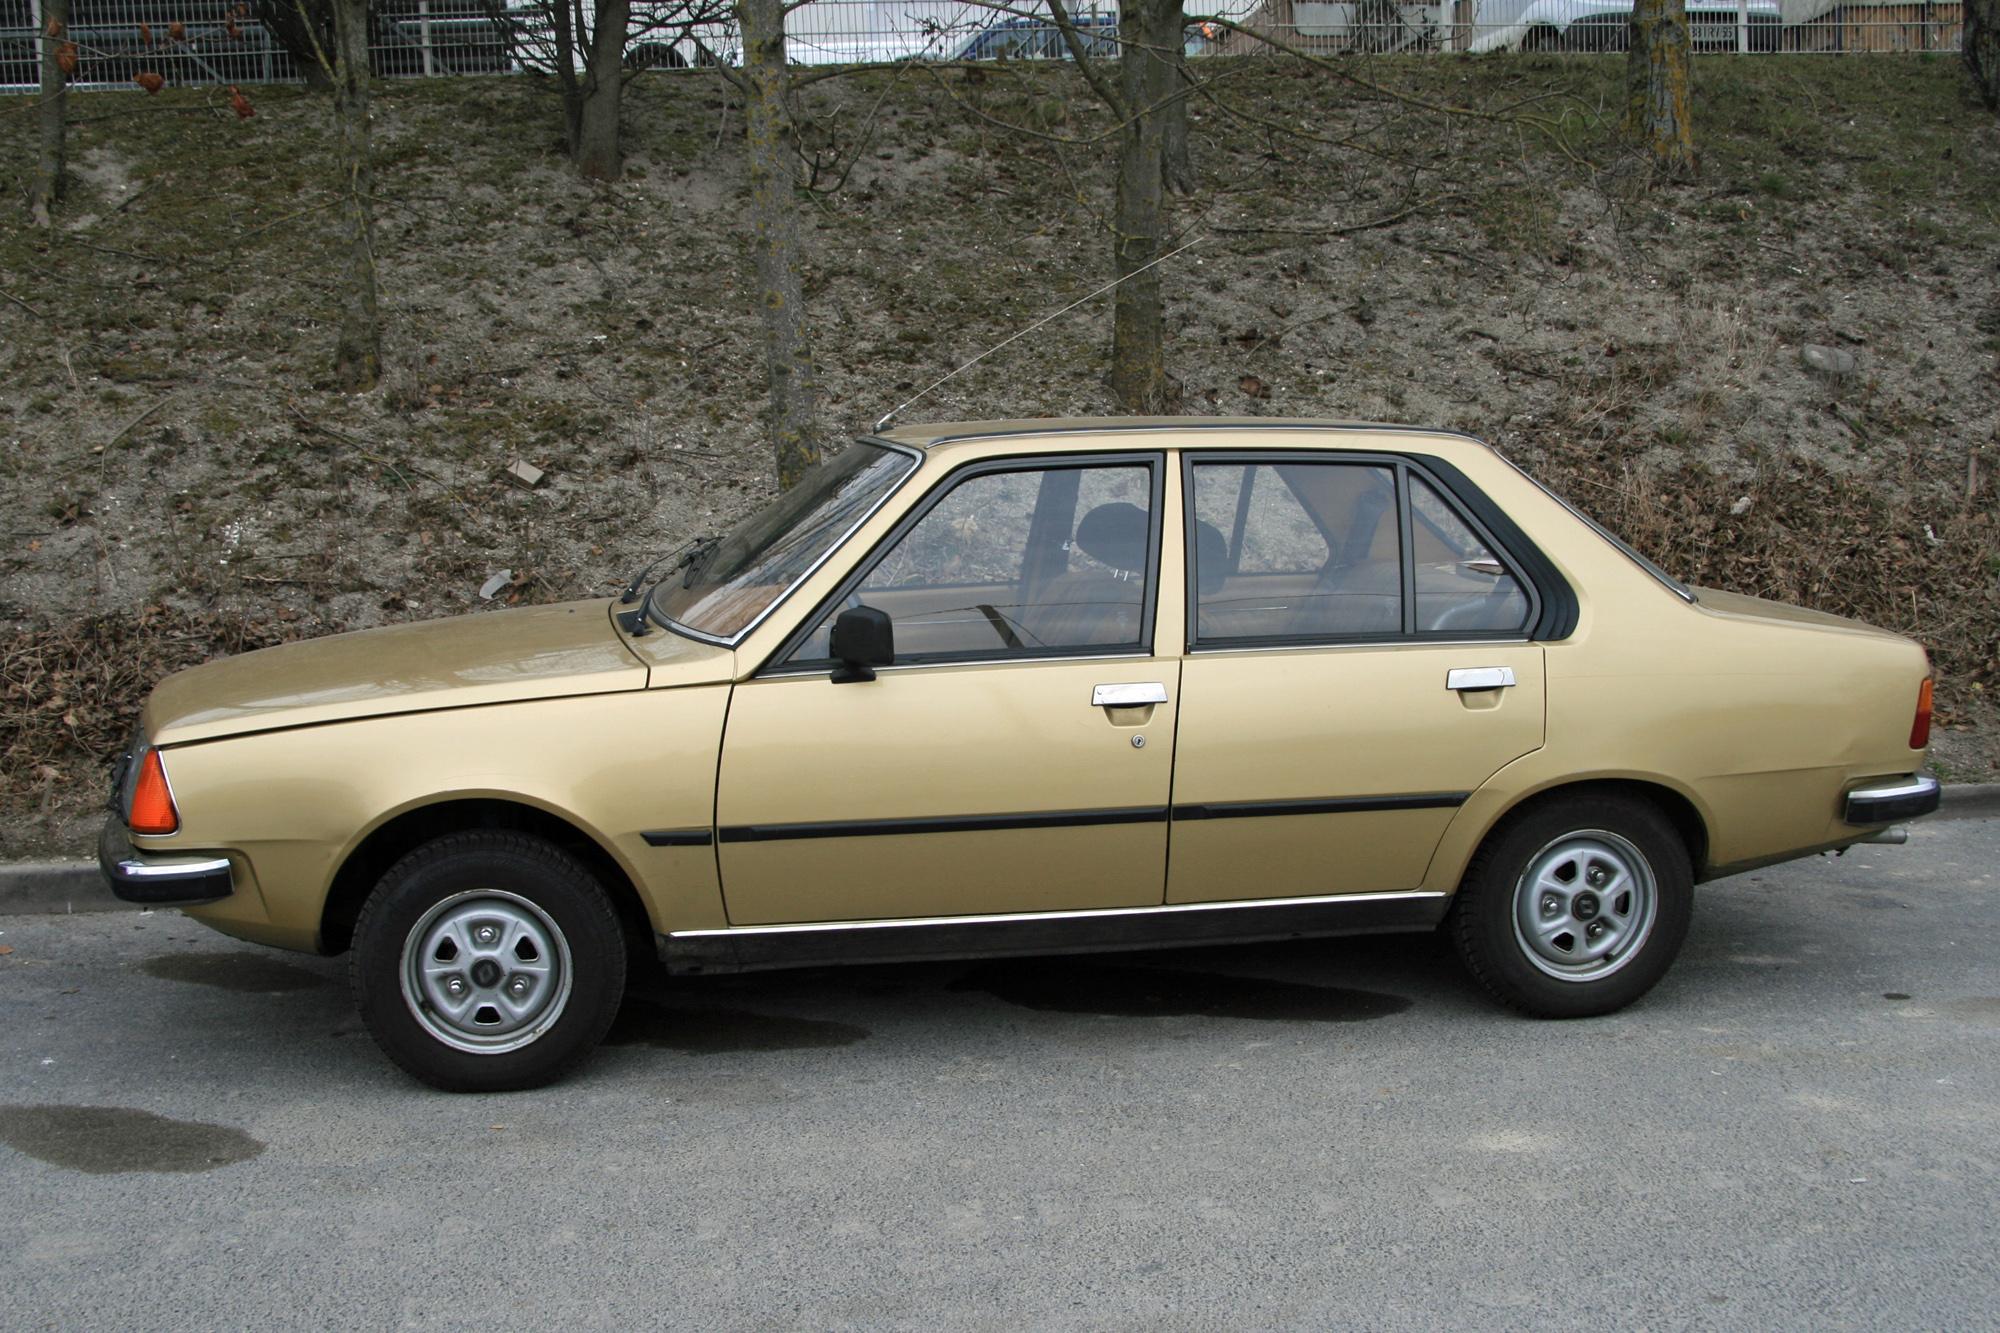 renault 18 tl type 2 50 images hd car wallpaper